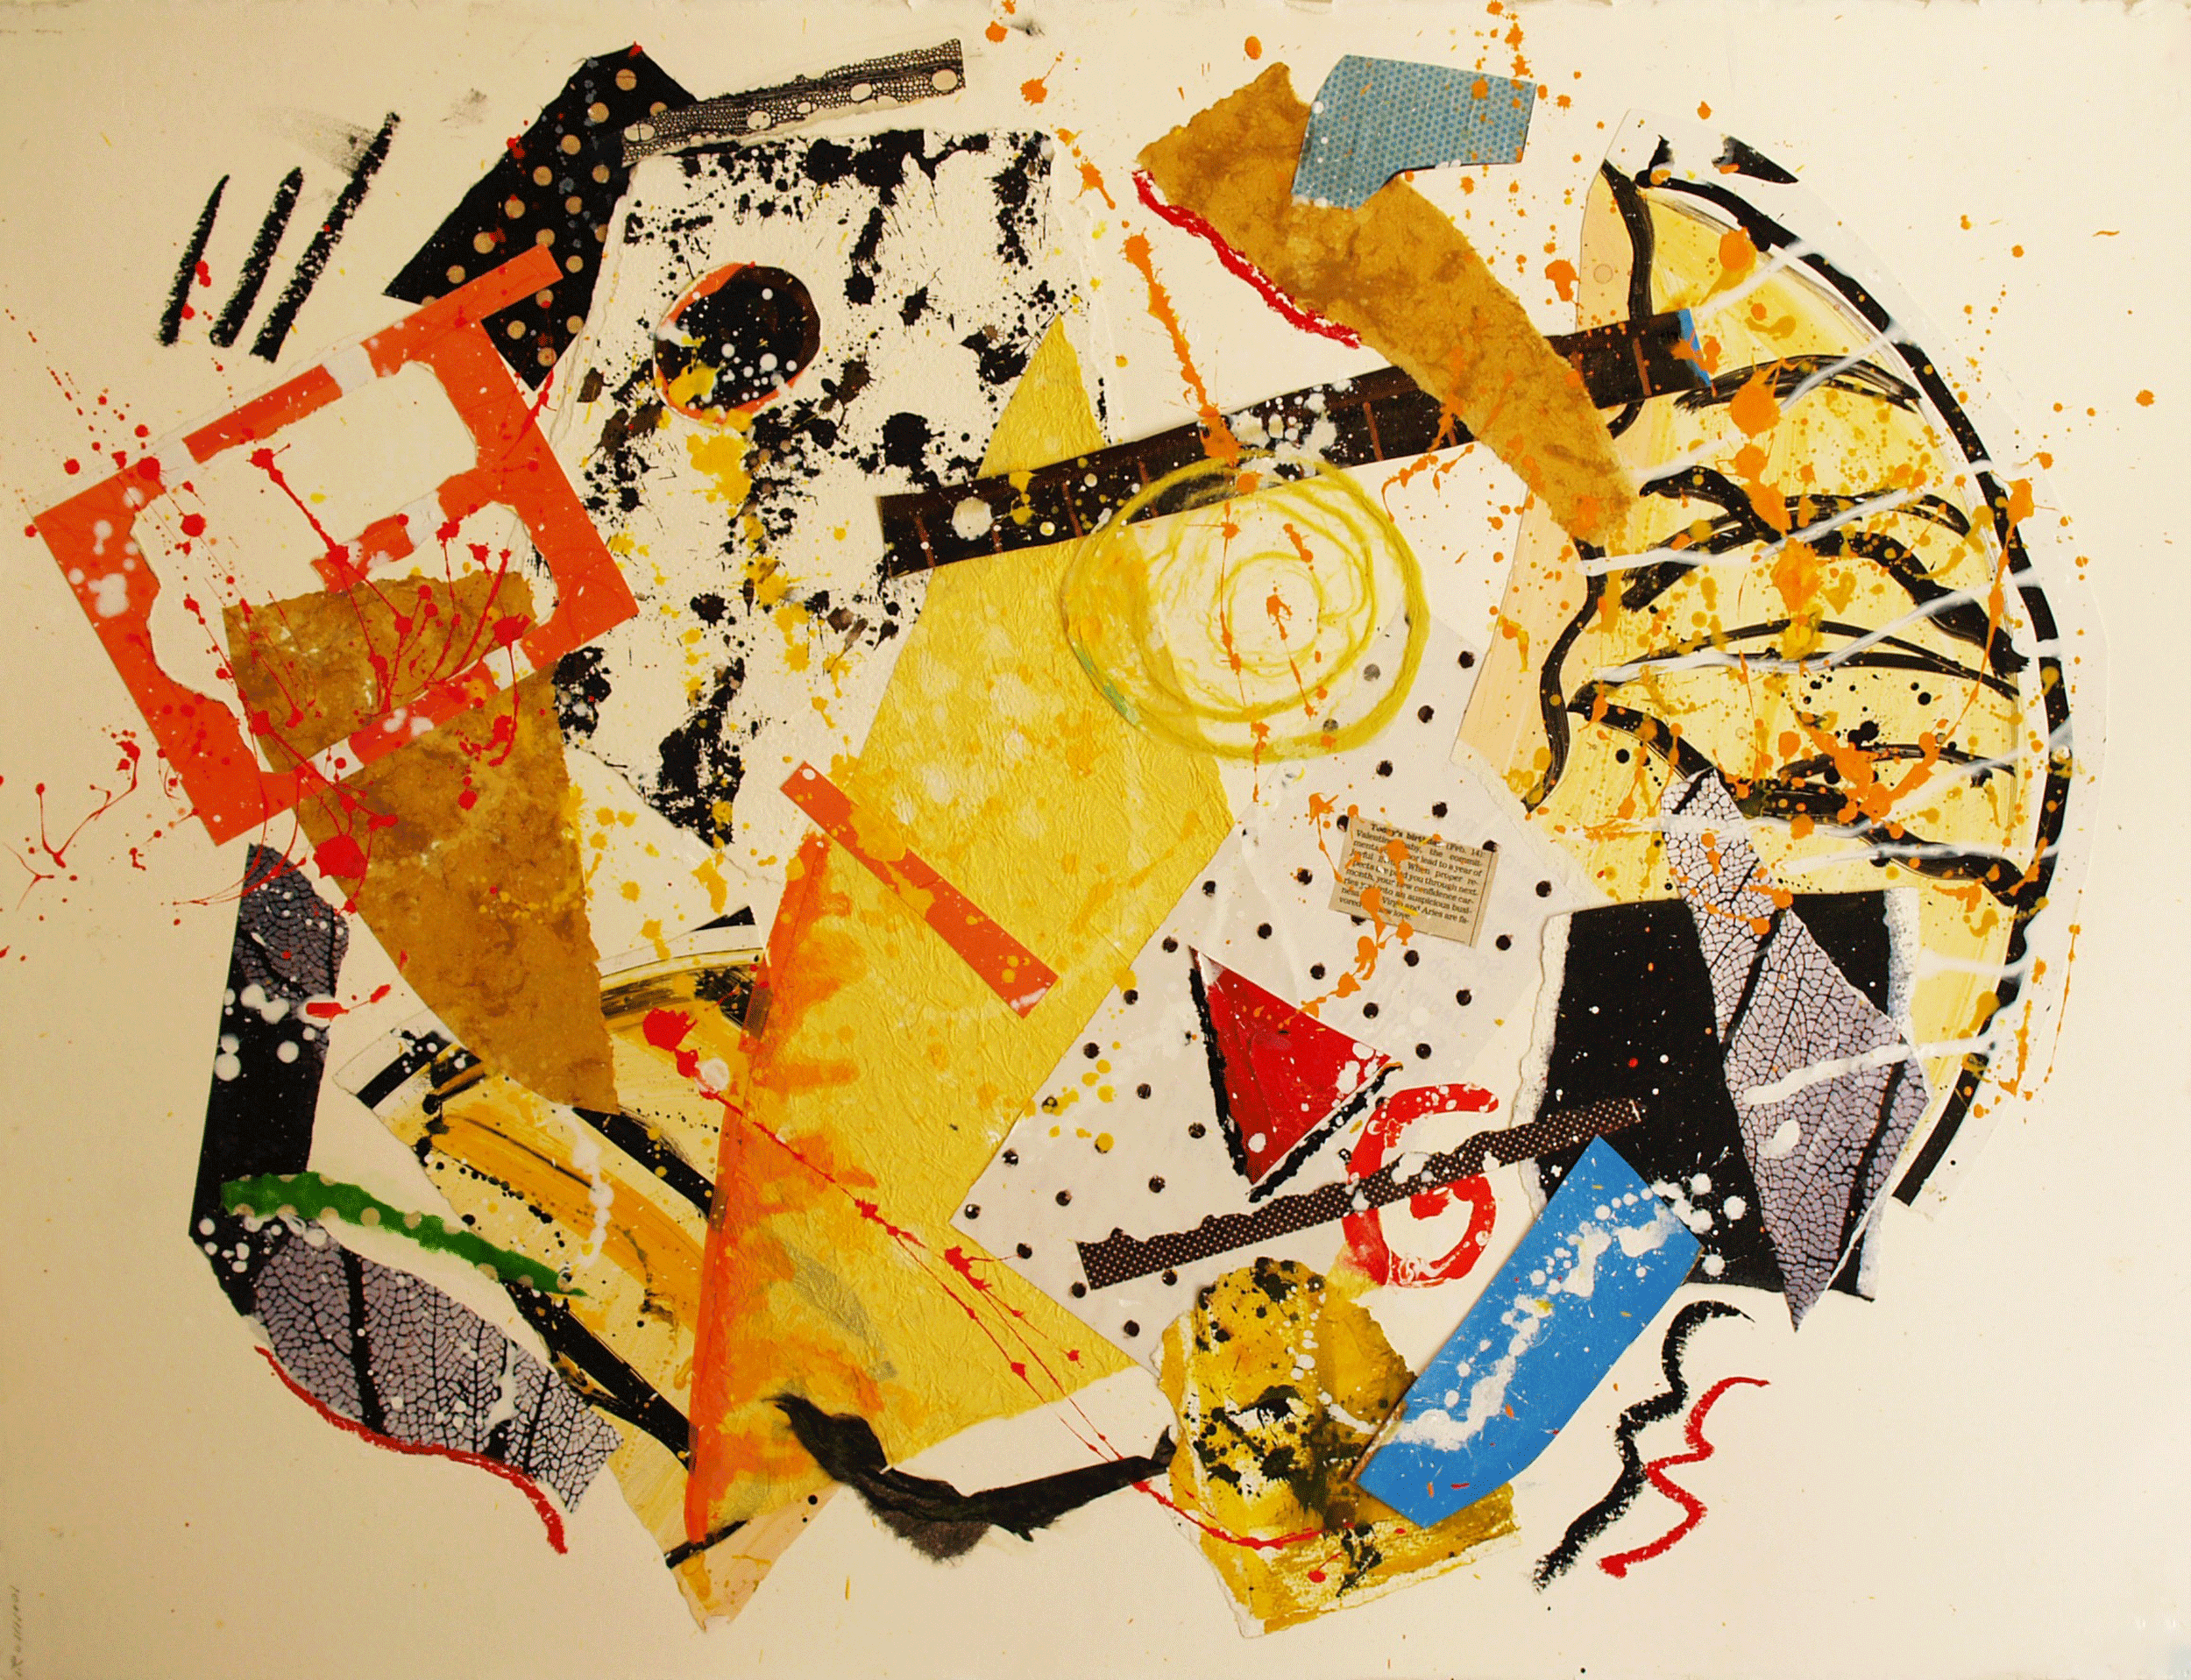 susan-levin-art-untitled-5.png